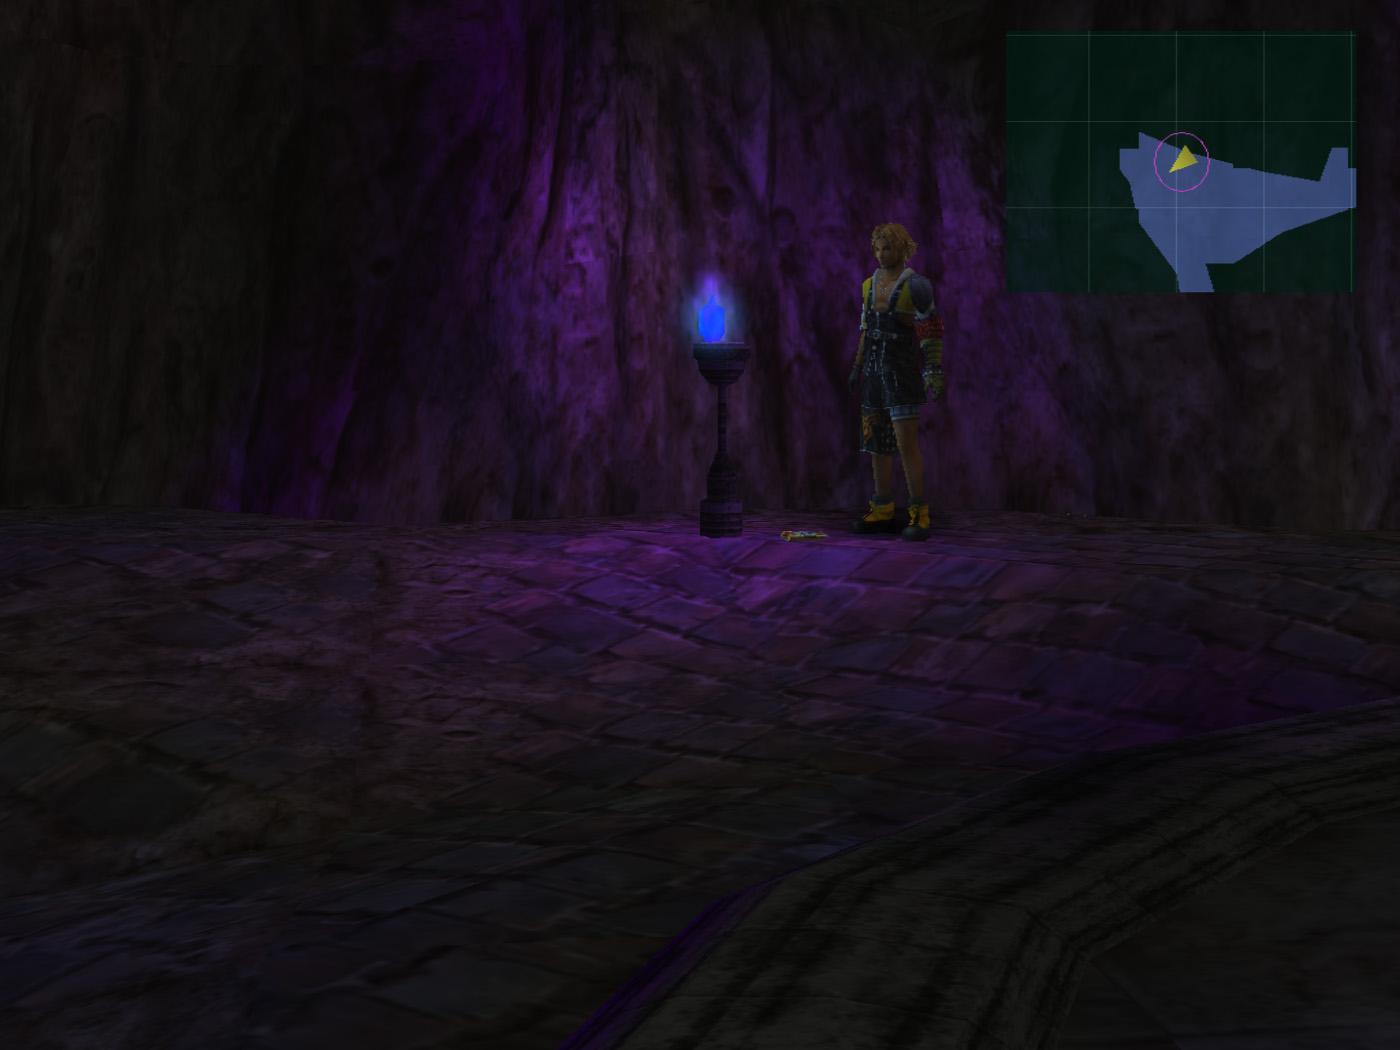 Final Fantasy X Al Bhed Primer Locations 3 Cirnopoly